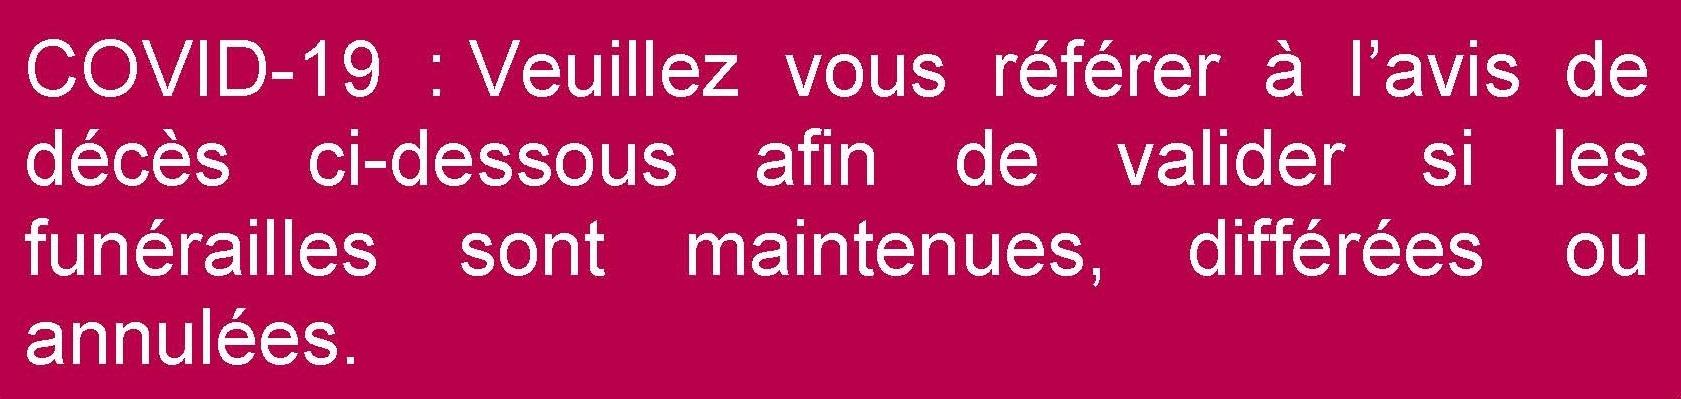 covid-19_bandeau_avis_de_dcs_04